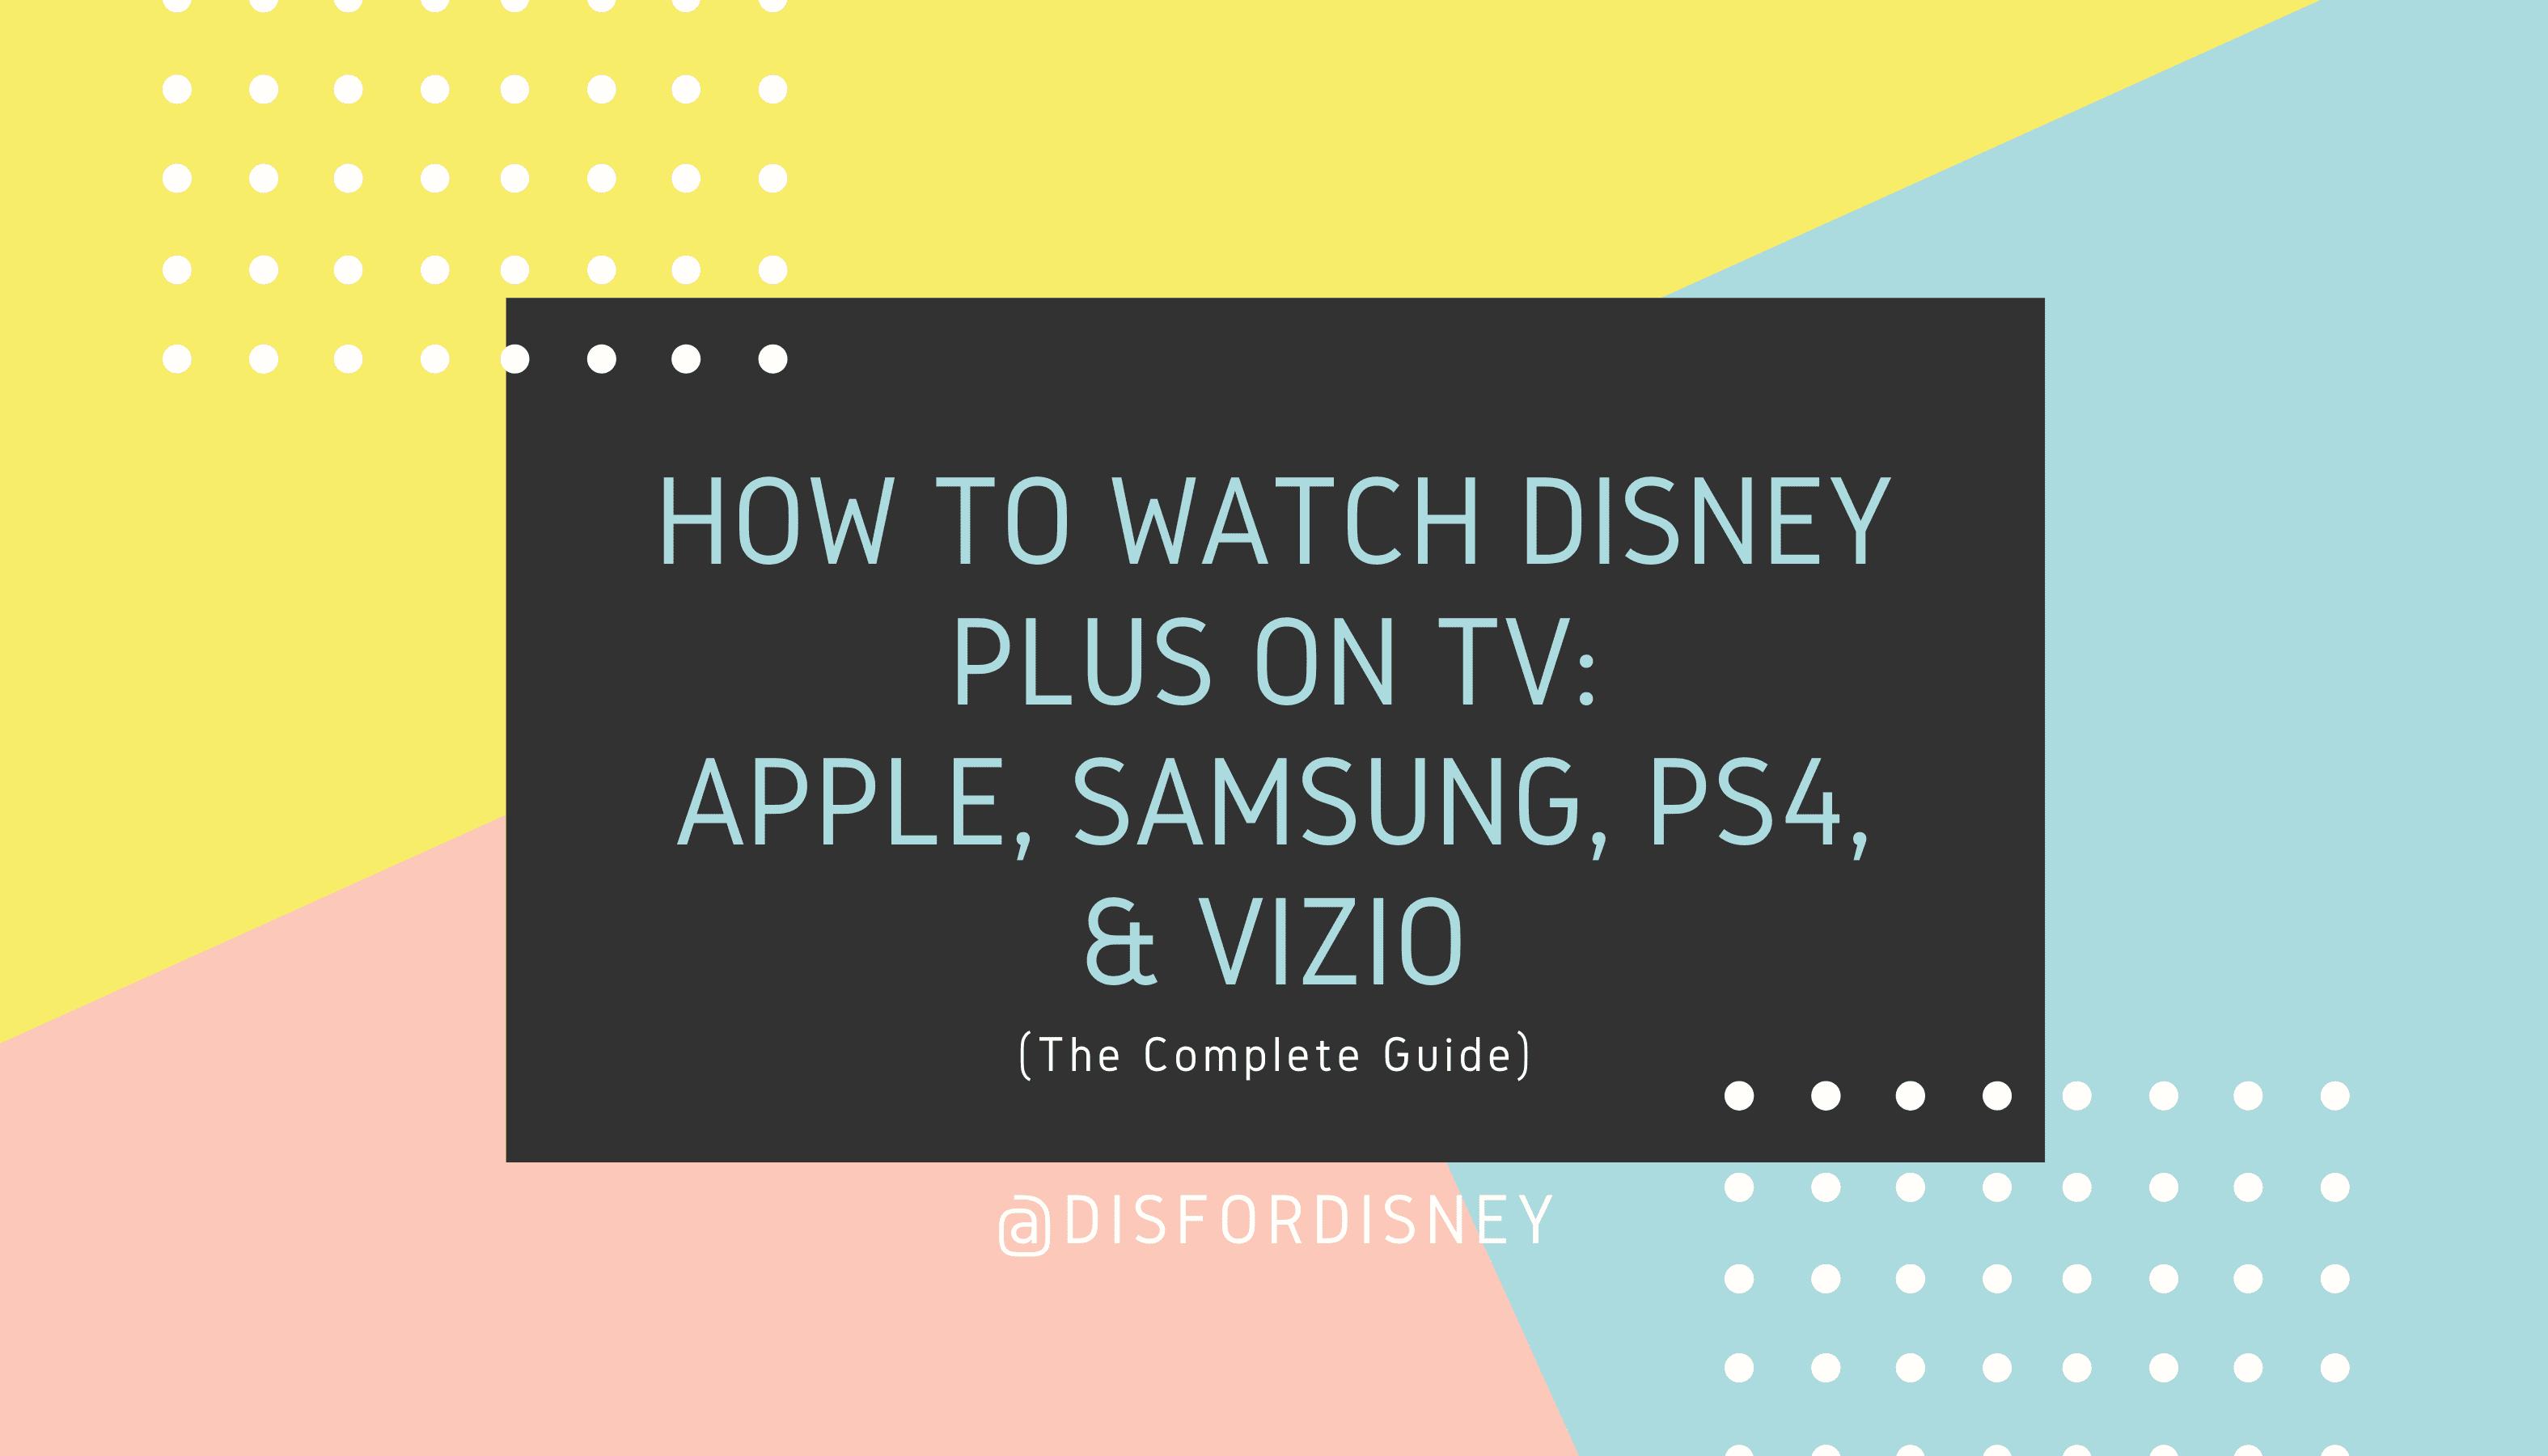 How to Watch Disney Plus on TV